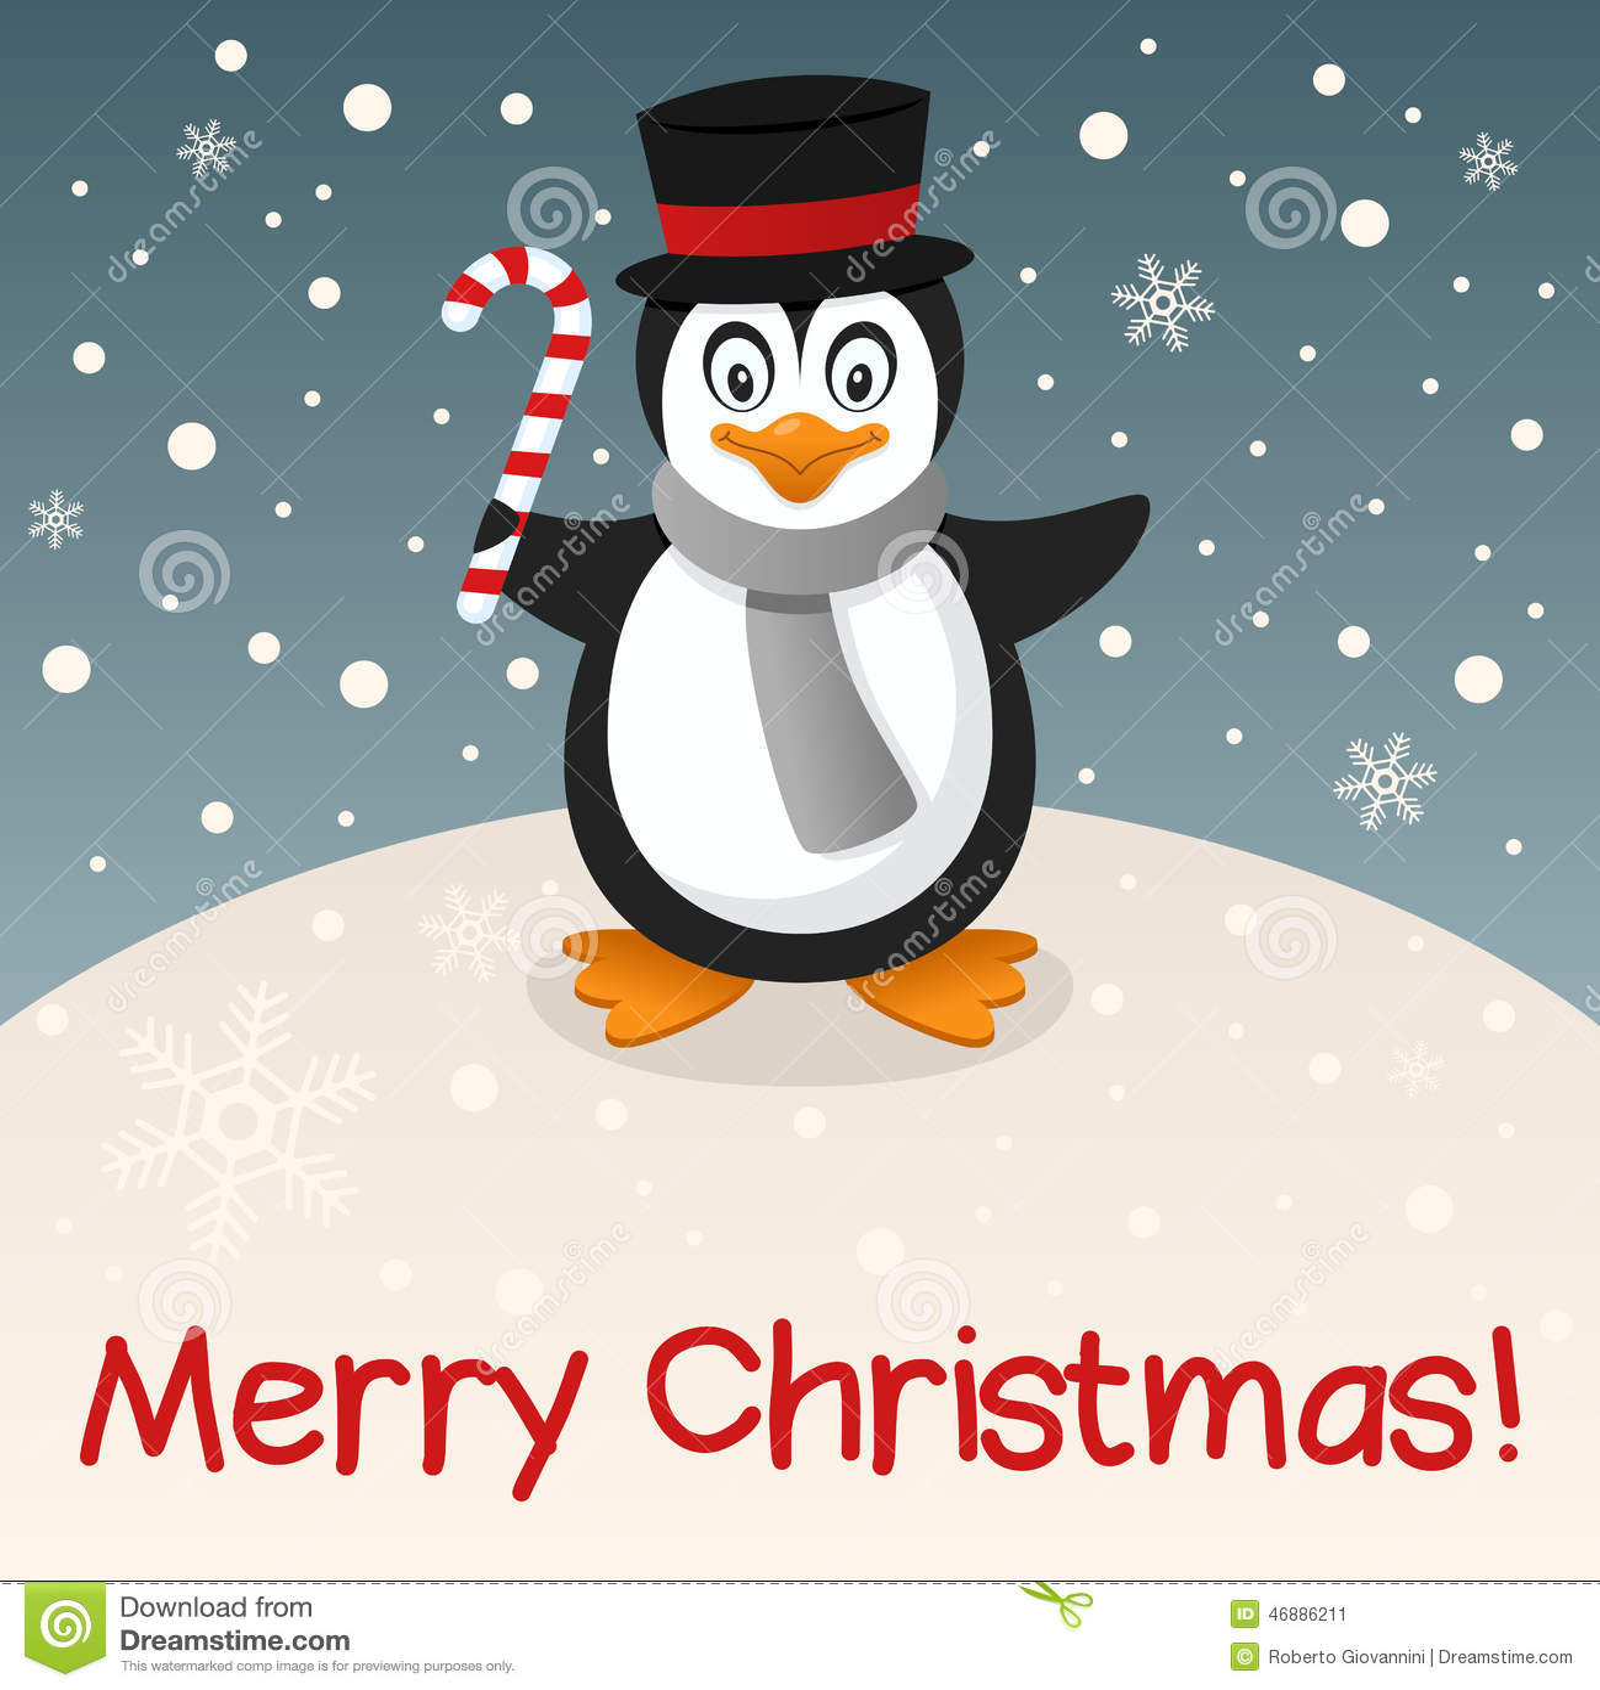 Penguin merry christmas card stock vector illustration for Penguin christmas cards homemade